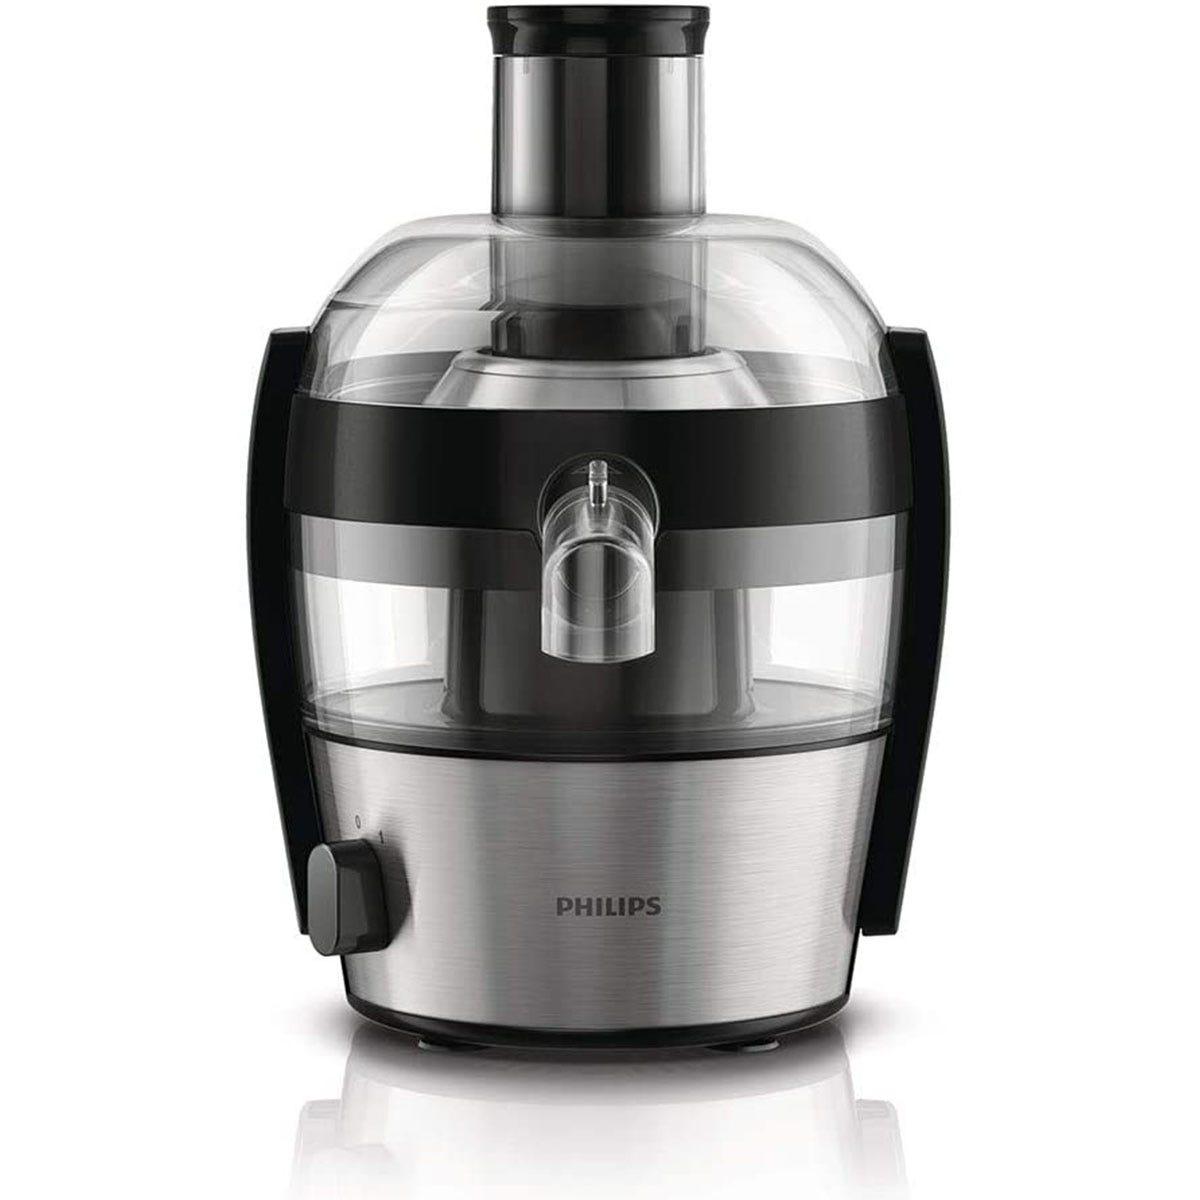 Philips HR1836/01 Viva Compact Juicer - Grey